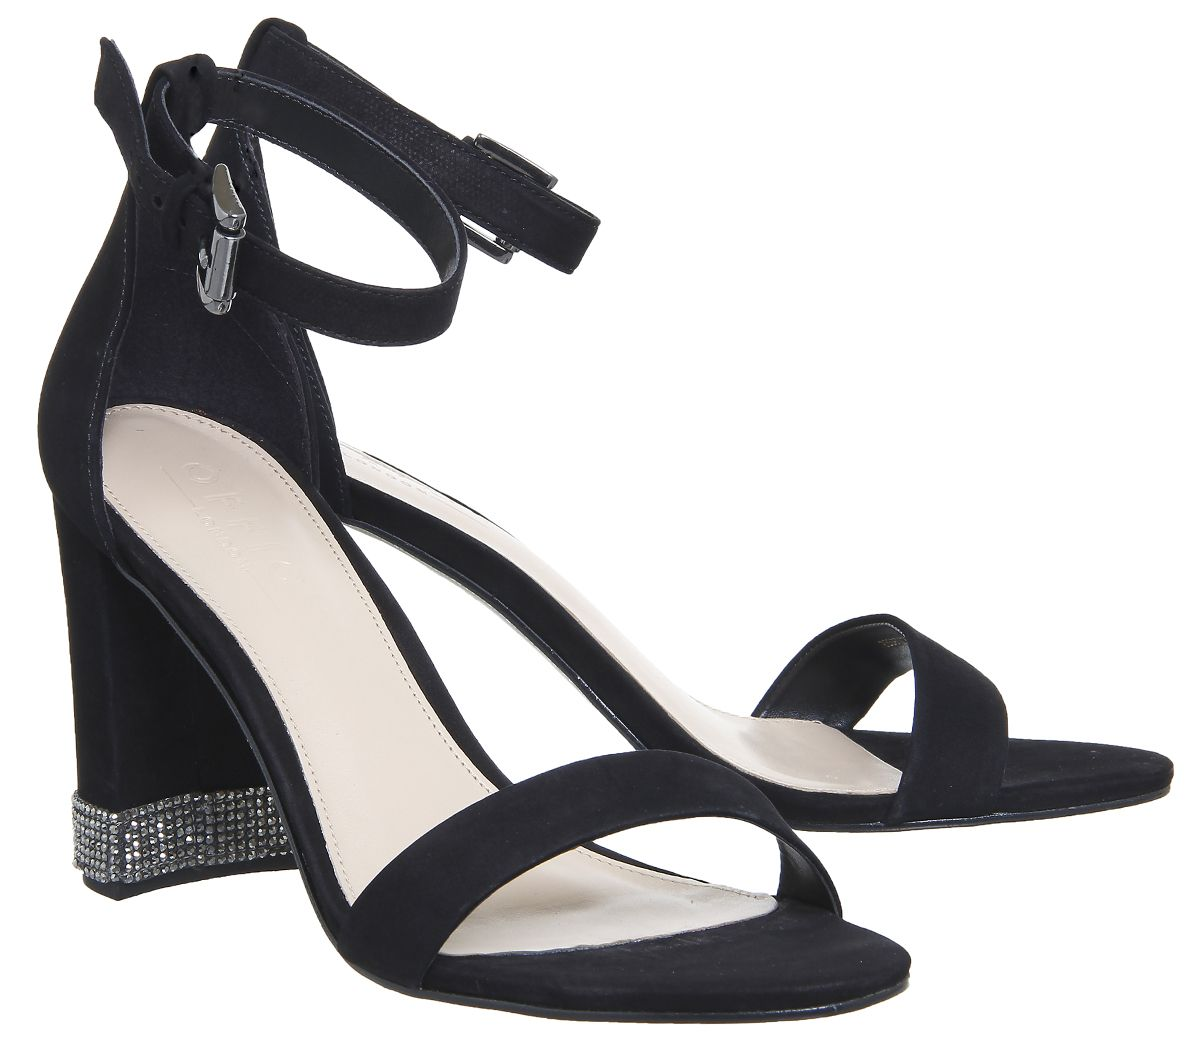 27407acdaf9 Office Nina Block Heel Sandal Black Nubuck With Gunmetal Gem Trim ...